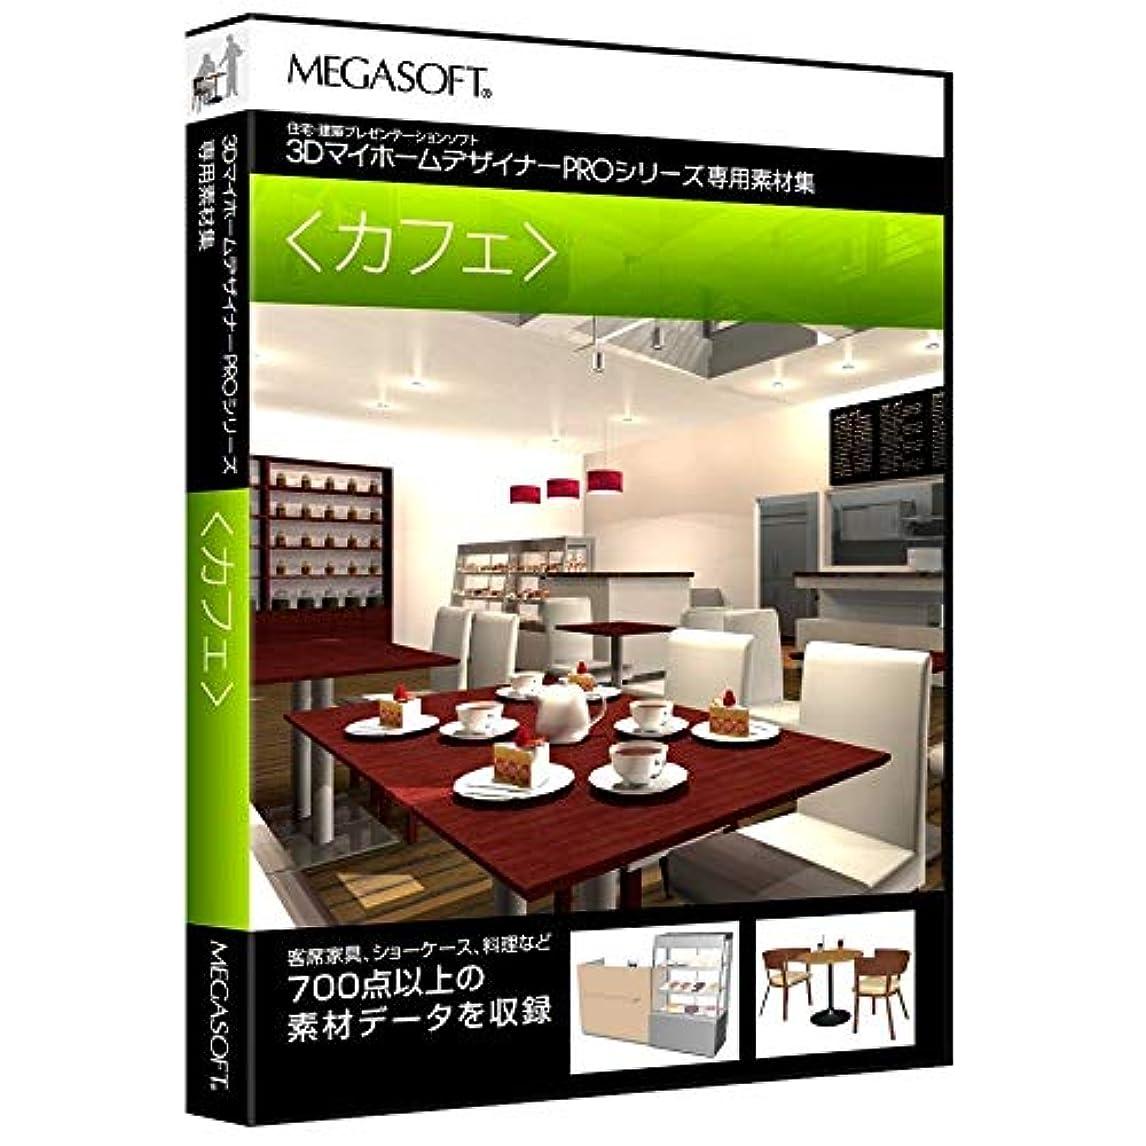 3DマイホームデザイナーPRO専用素材集<カフェ>